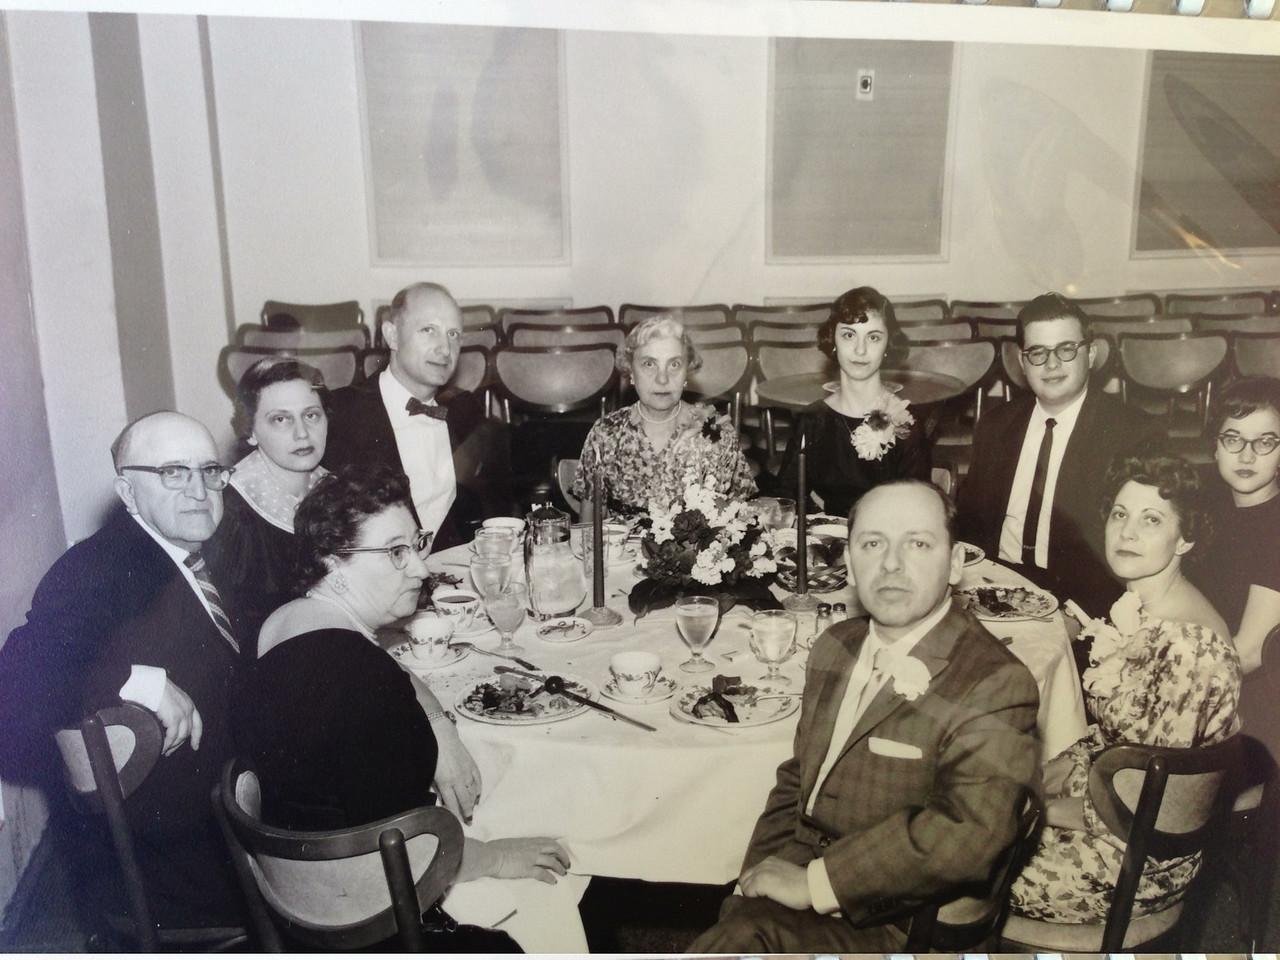 (start in lower left and go clockwise) Michael Milchin (my Hebrew school teacher) and wife, Roz and Uncle Robert (Diane's oldest brother), Grandman Small, Sandy, lunatic boyfriend, ?, Diane, Bob.  David's Bar Mitzvah